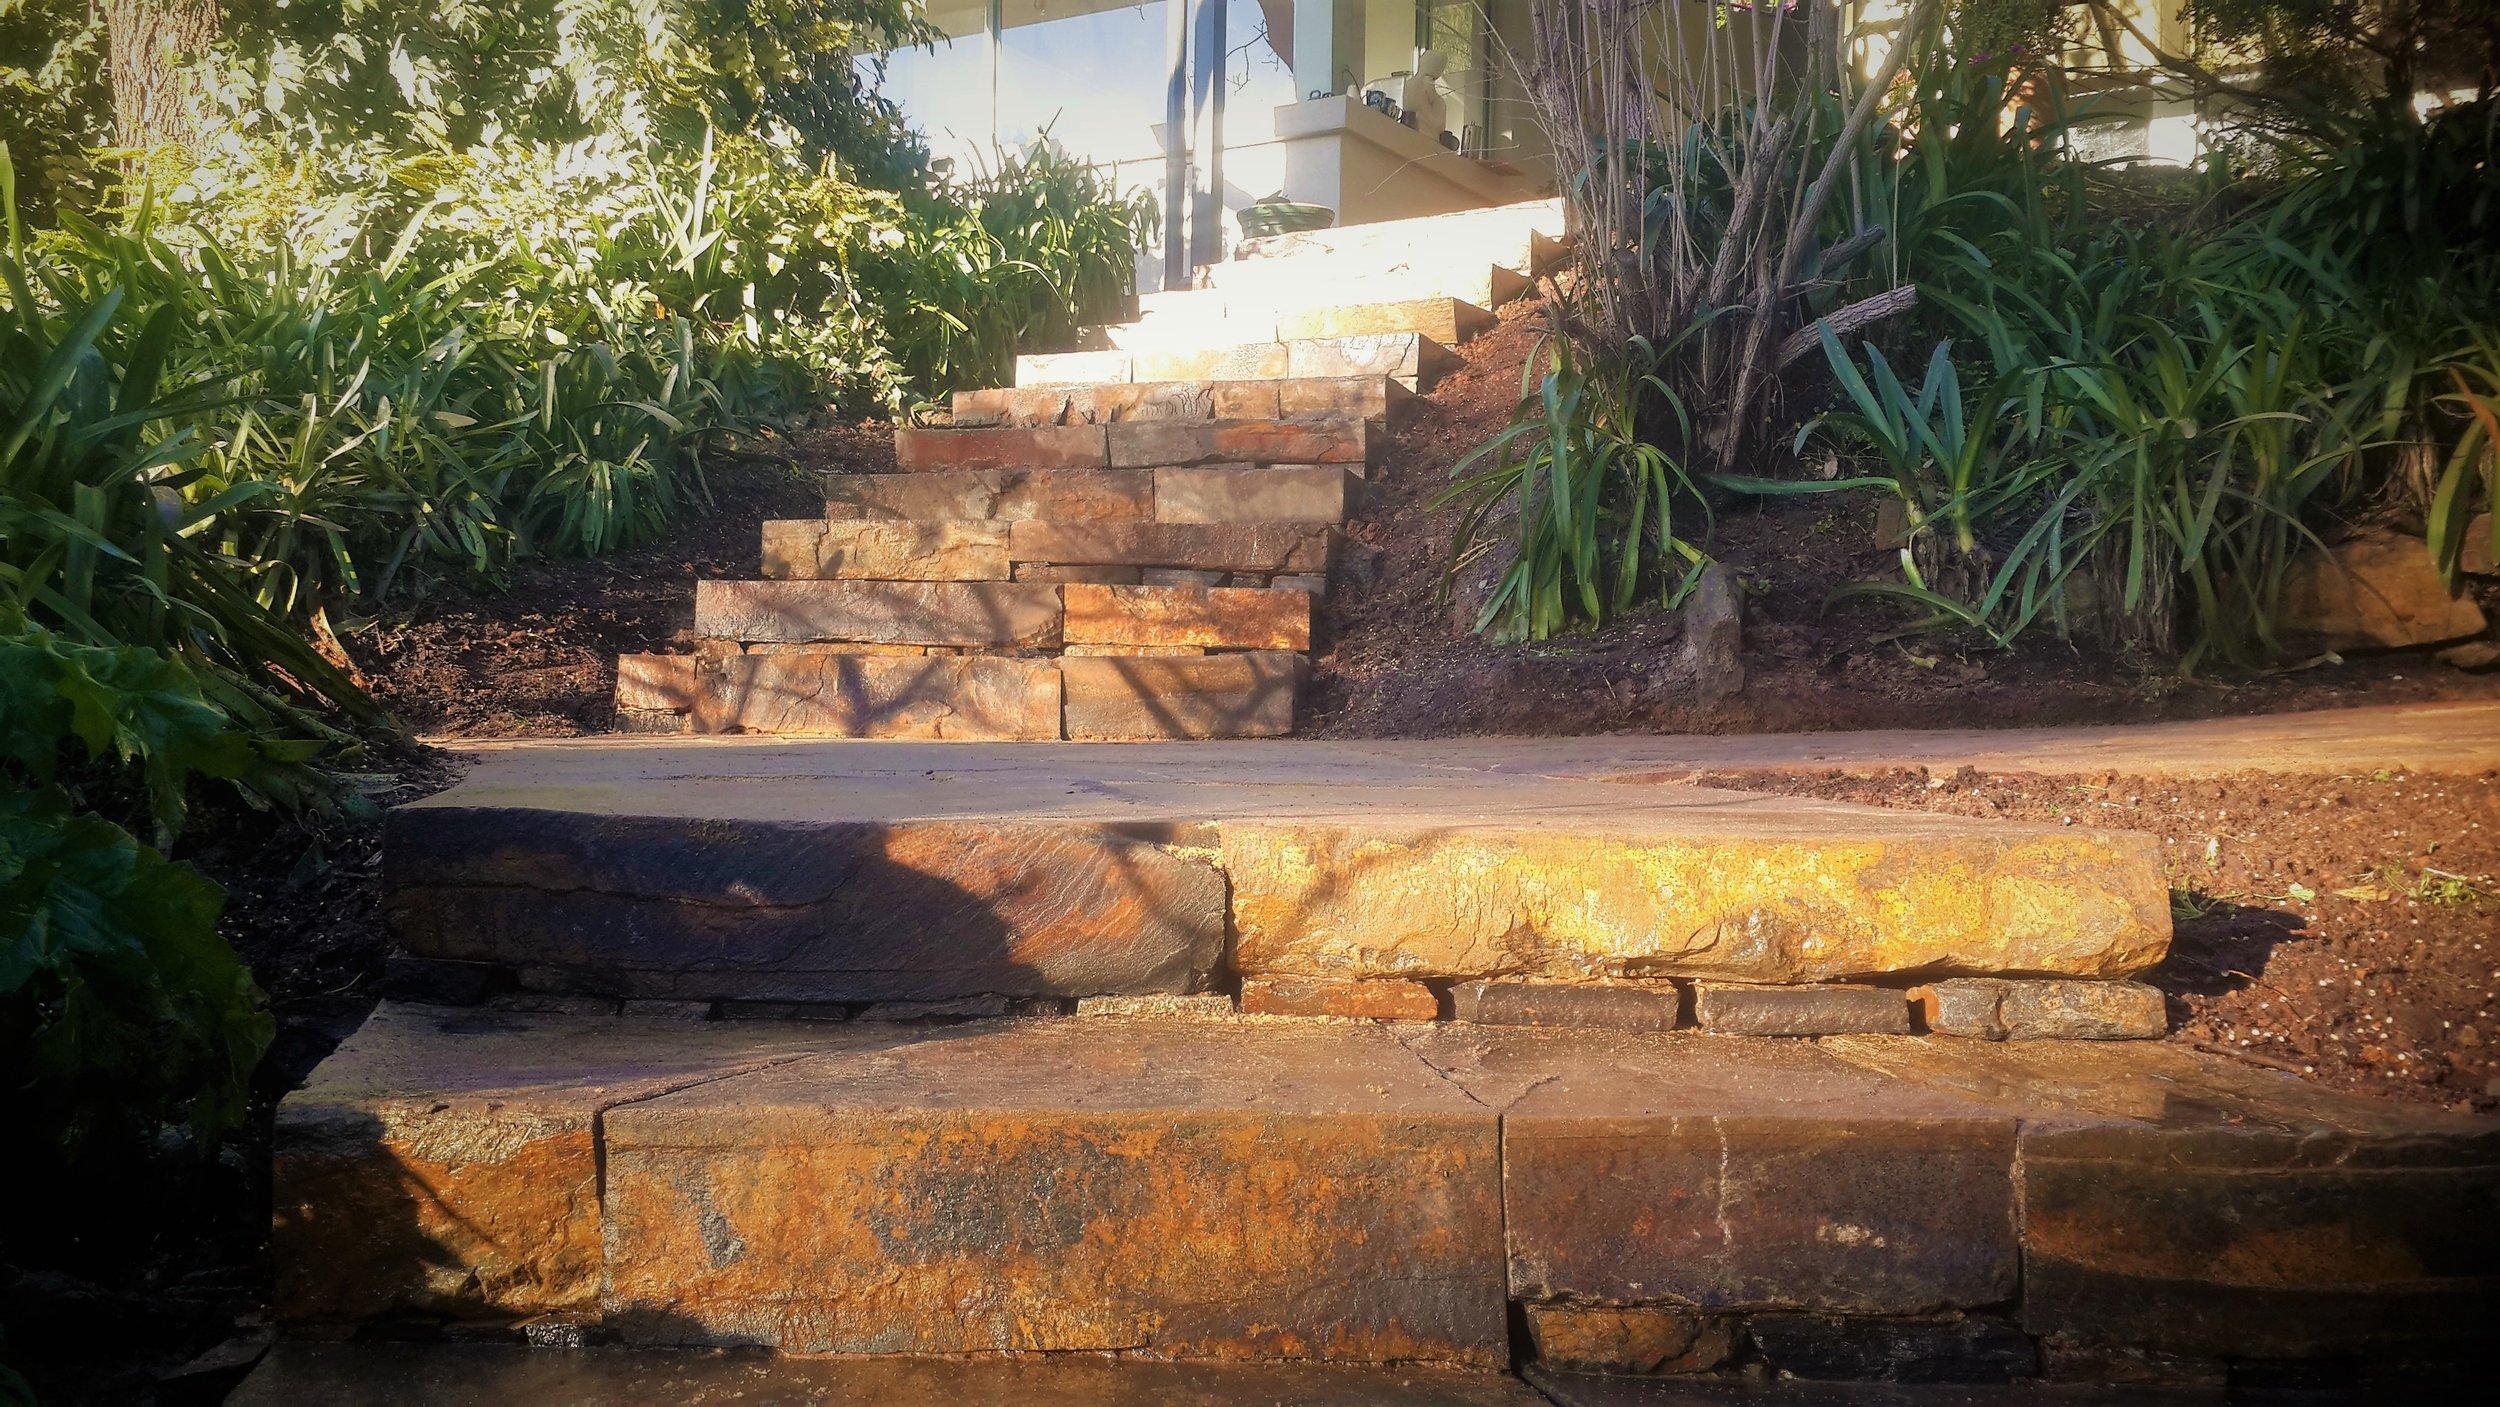 Dry Laid Kanmantoo Bluestone Steps, Norton Summit, South Australia